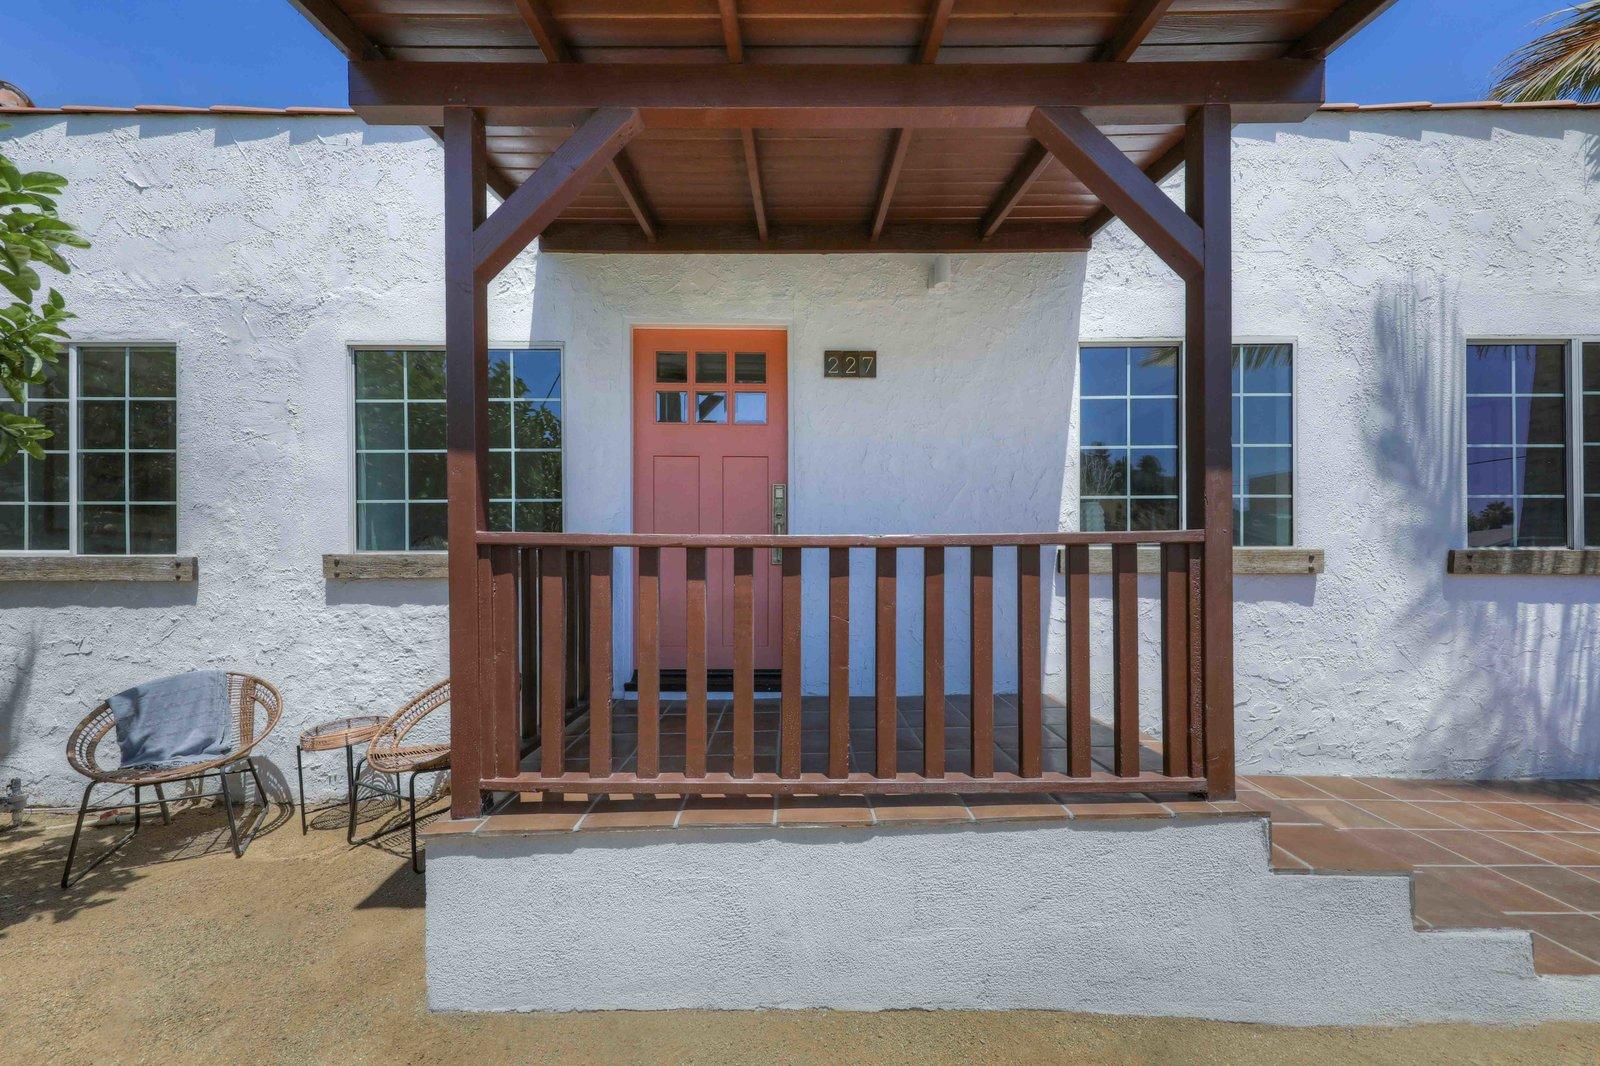 Los Angeles Spanish Bungalow front porch